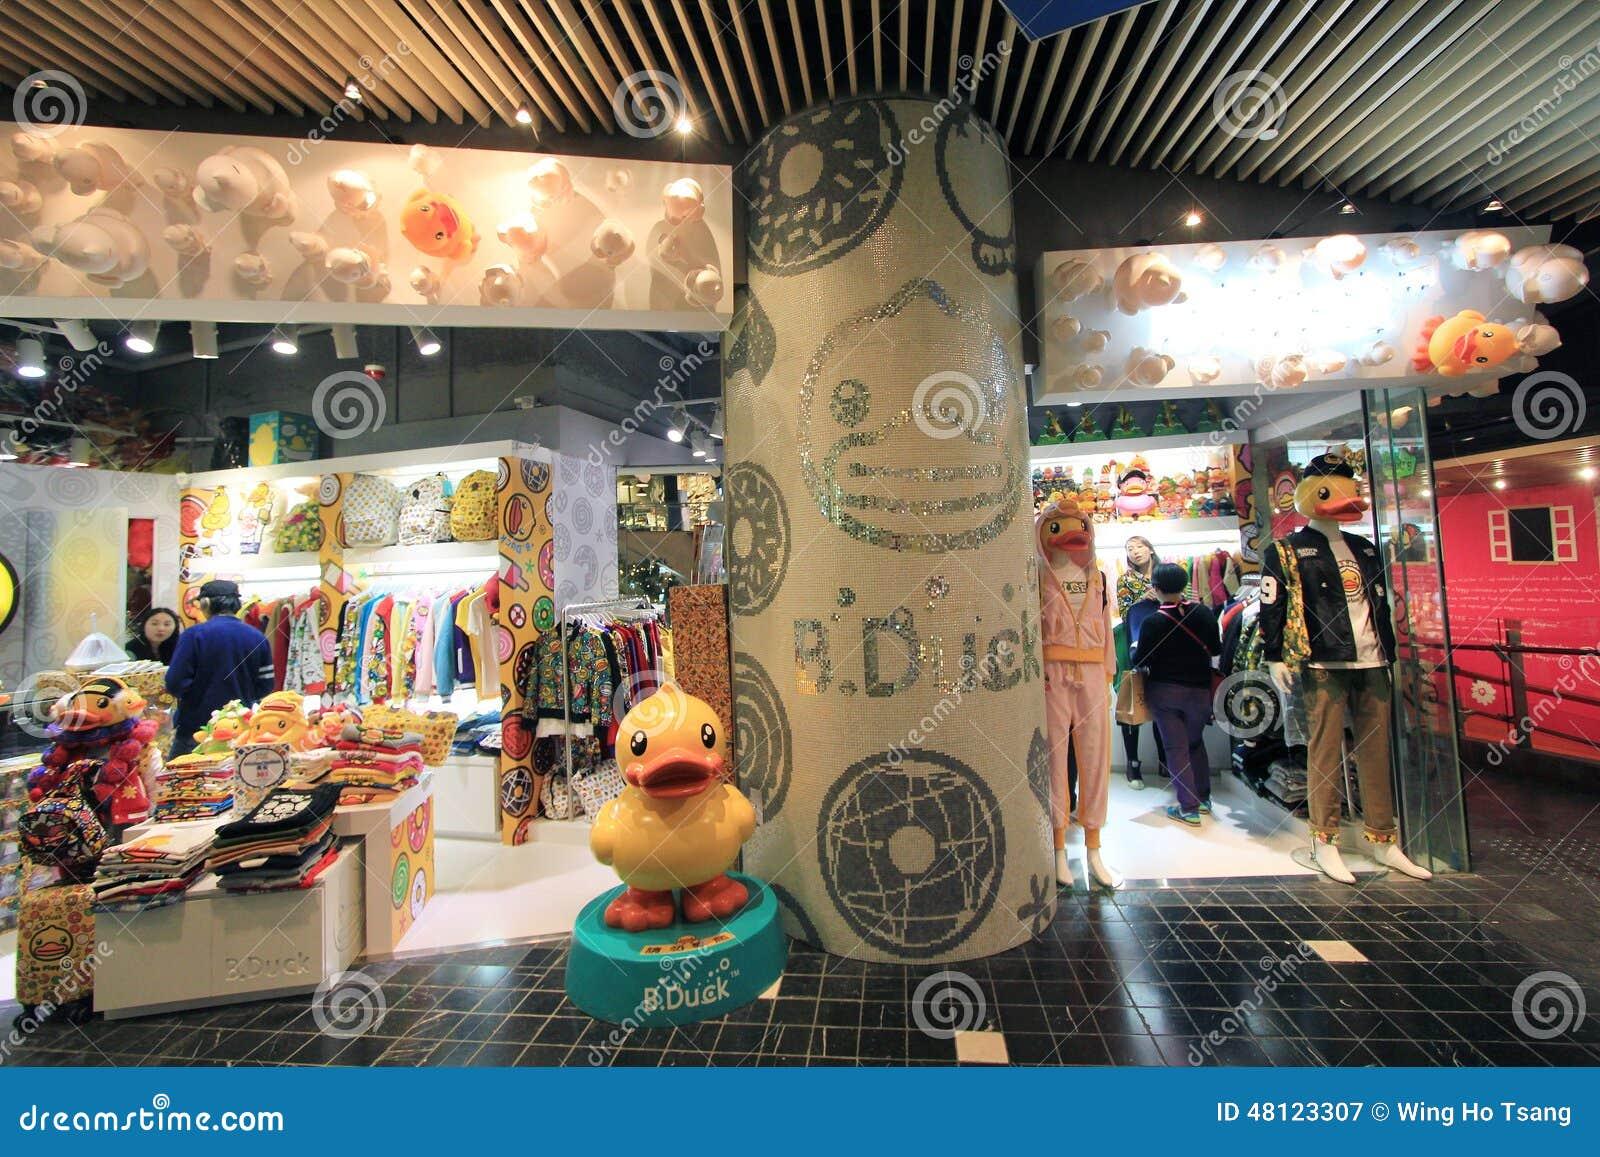 b duck shop in hong kong editorial photography image